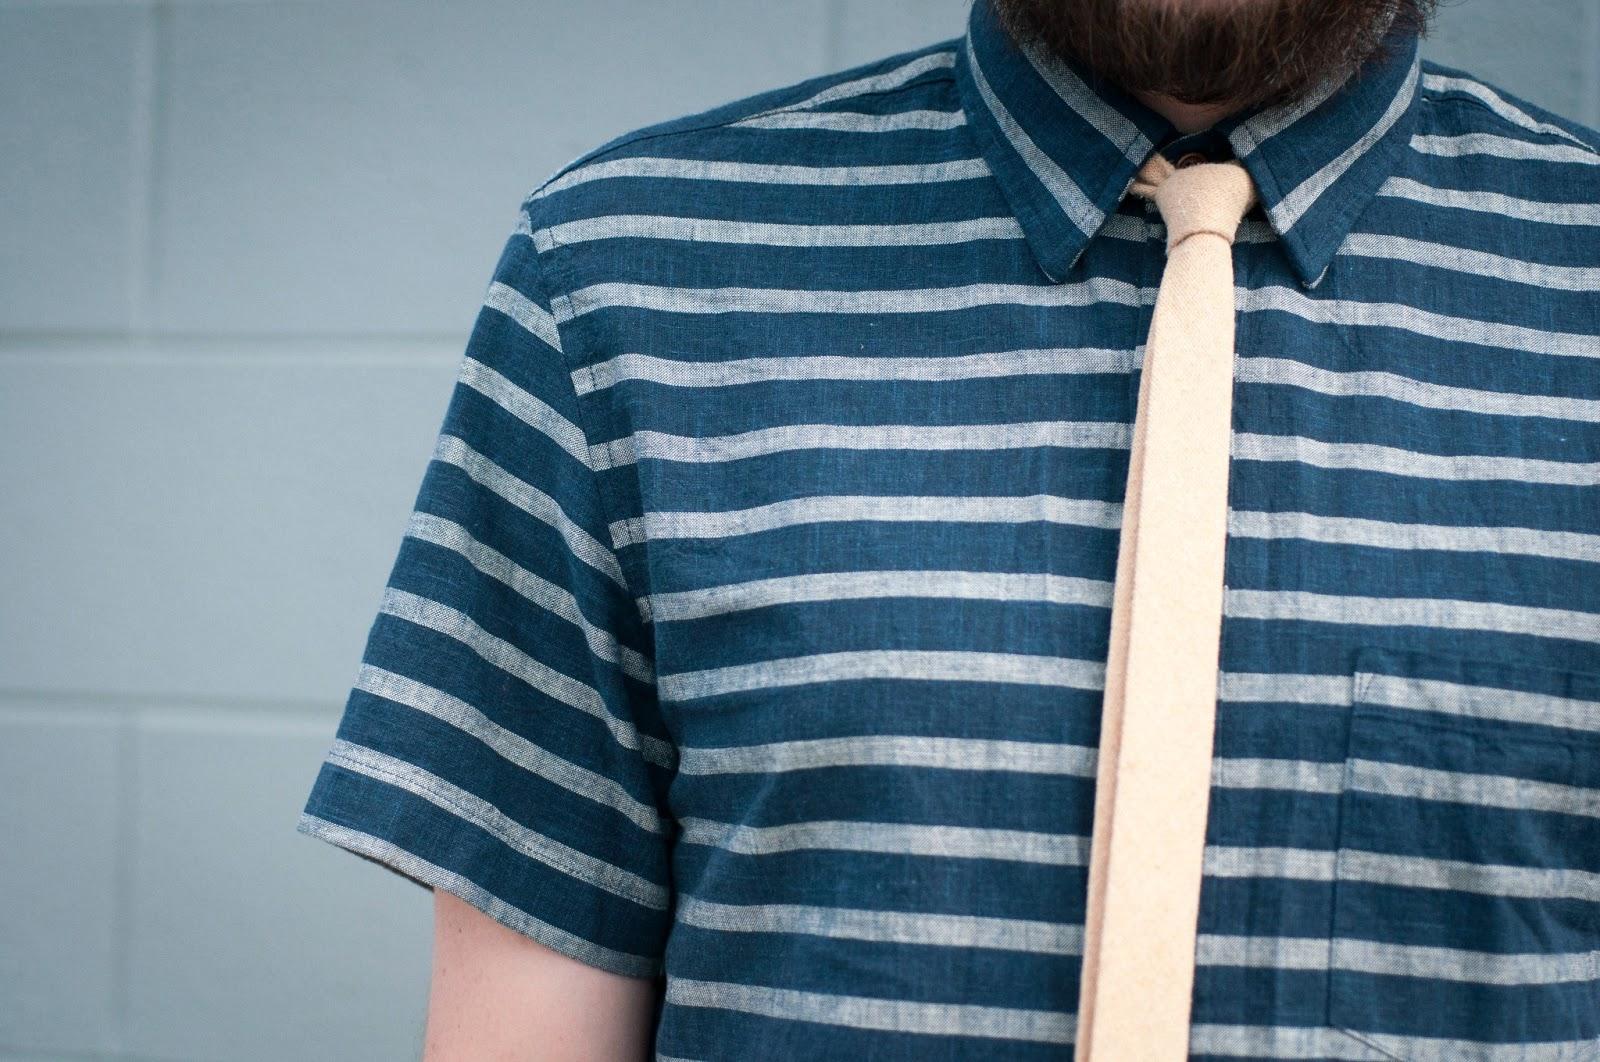 mens fashion blog, mens style blog, skinny tie, stripes, jcrew short sleeve short, jcrew, ootd